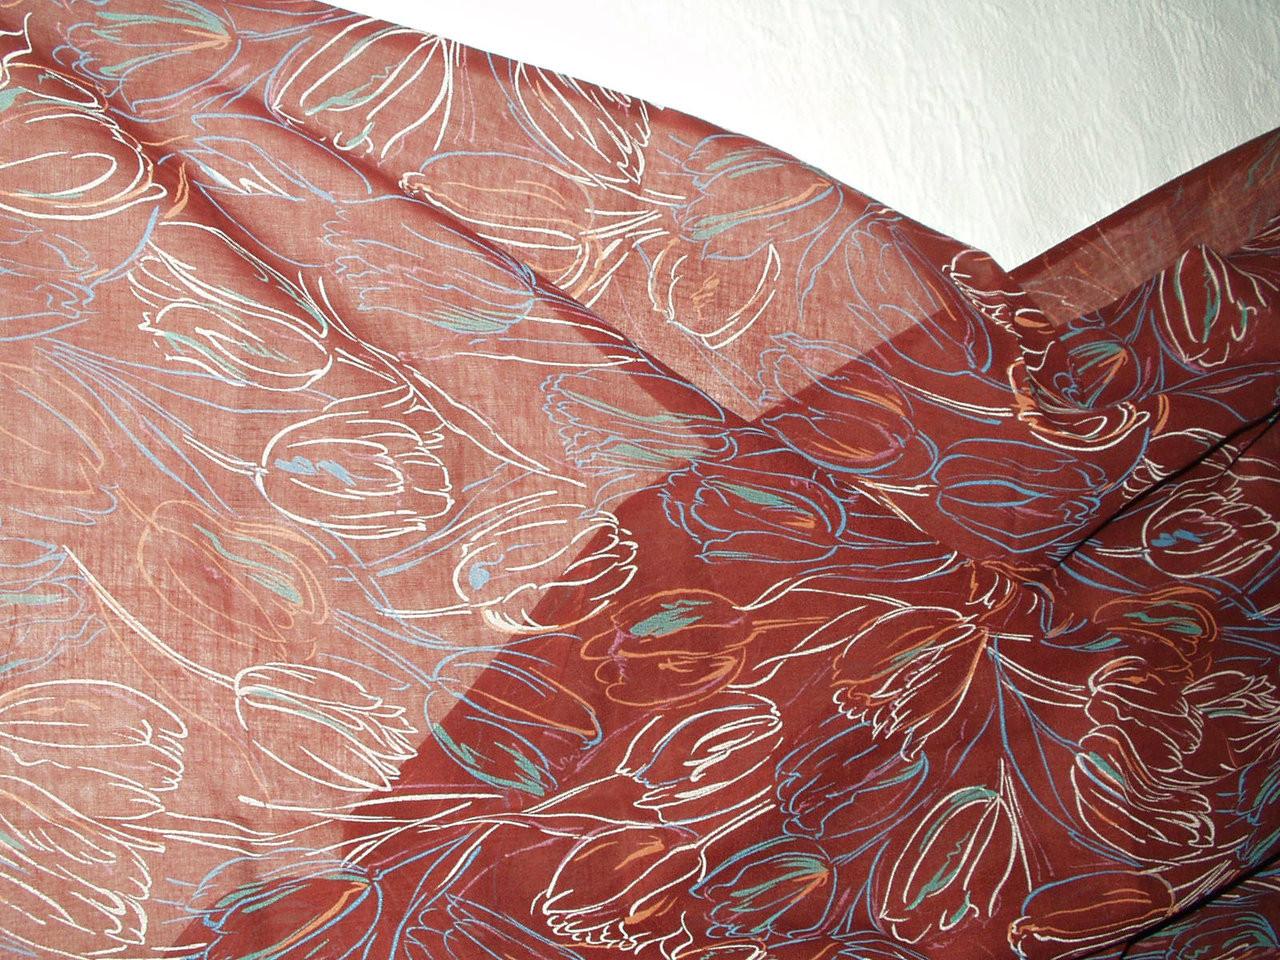 Vintage 1940 1950 Sheer Cotton Voile Tulip Motif Unused Dress Fabric